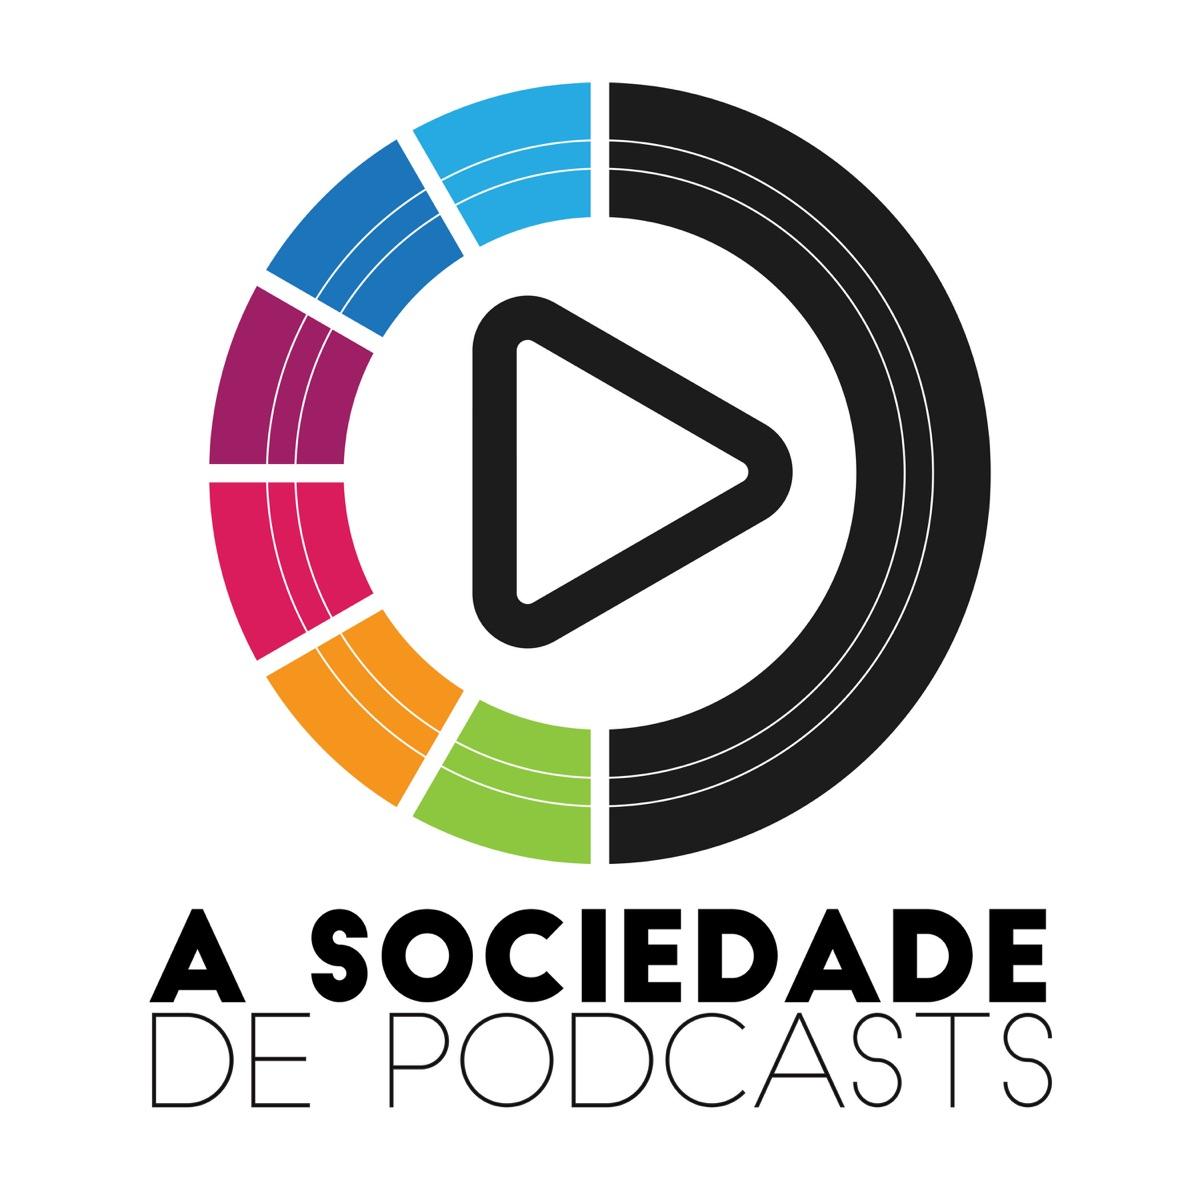 A Sociedade de Podcasts